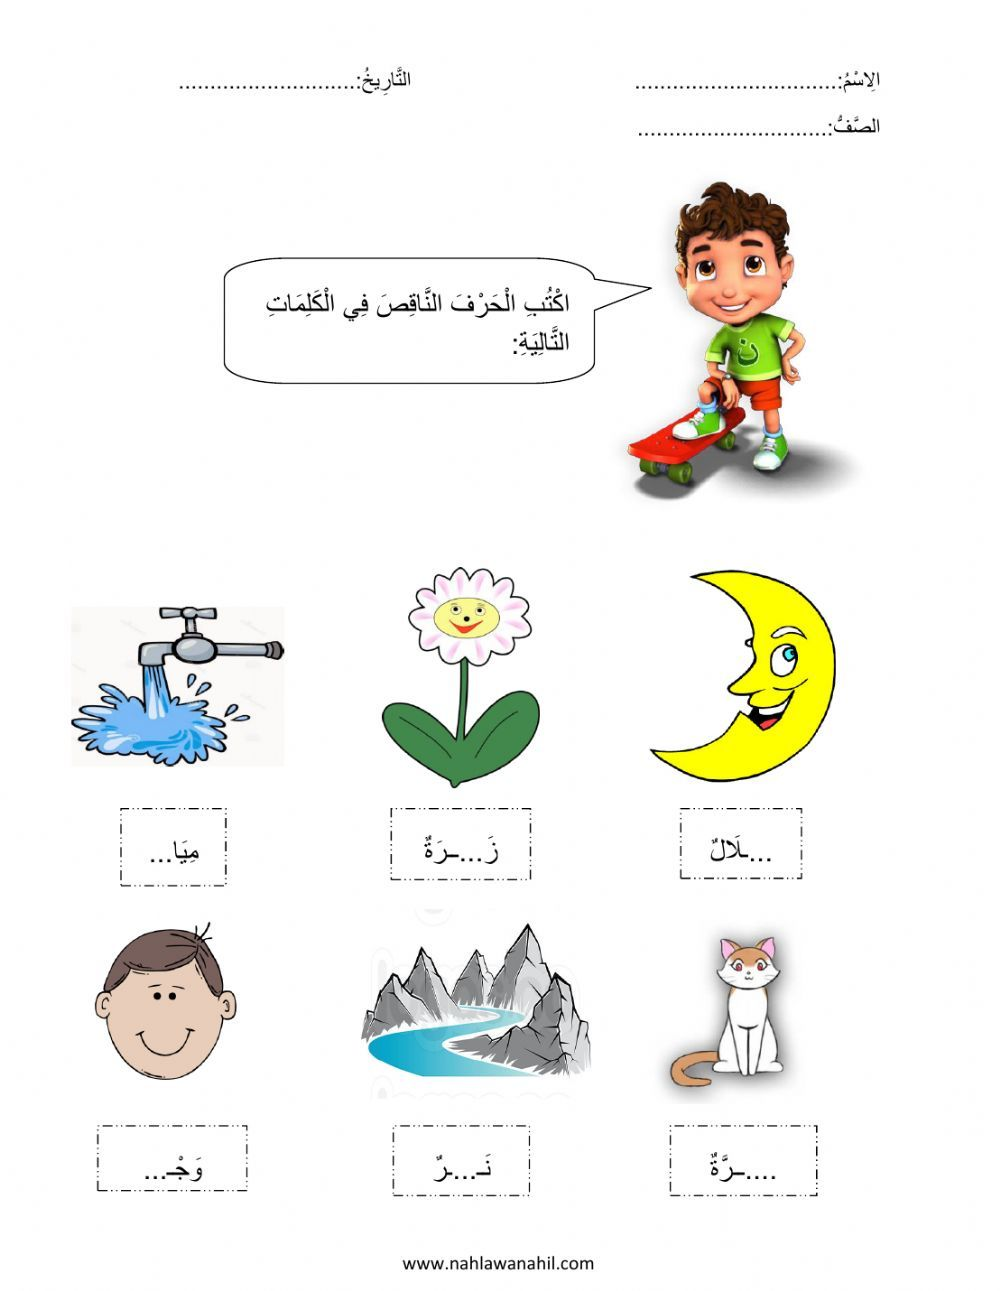 أكتب الحرف الناقص في الكلمة Online Worksheet For Kg2 You Can Do The Exercises Online Or Download The Arabic Alphabet For Kids Preschool Activities Arabic Kids